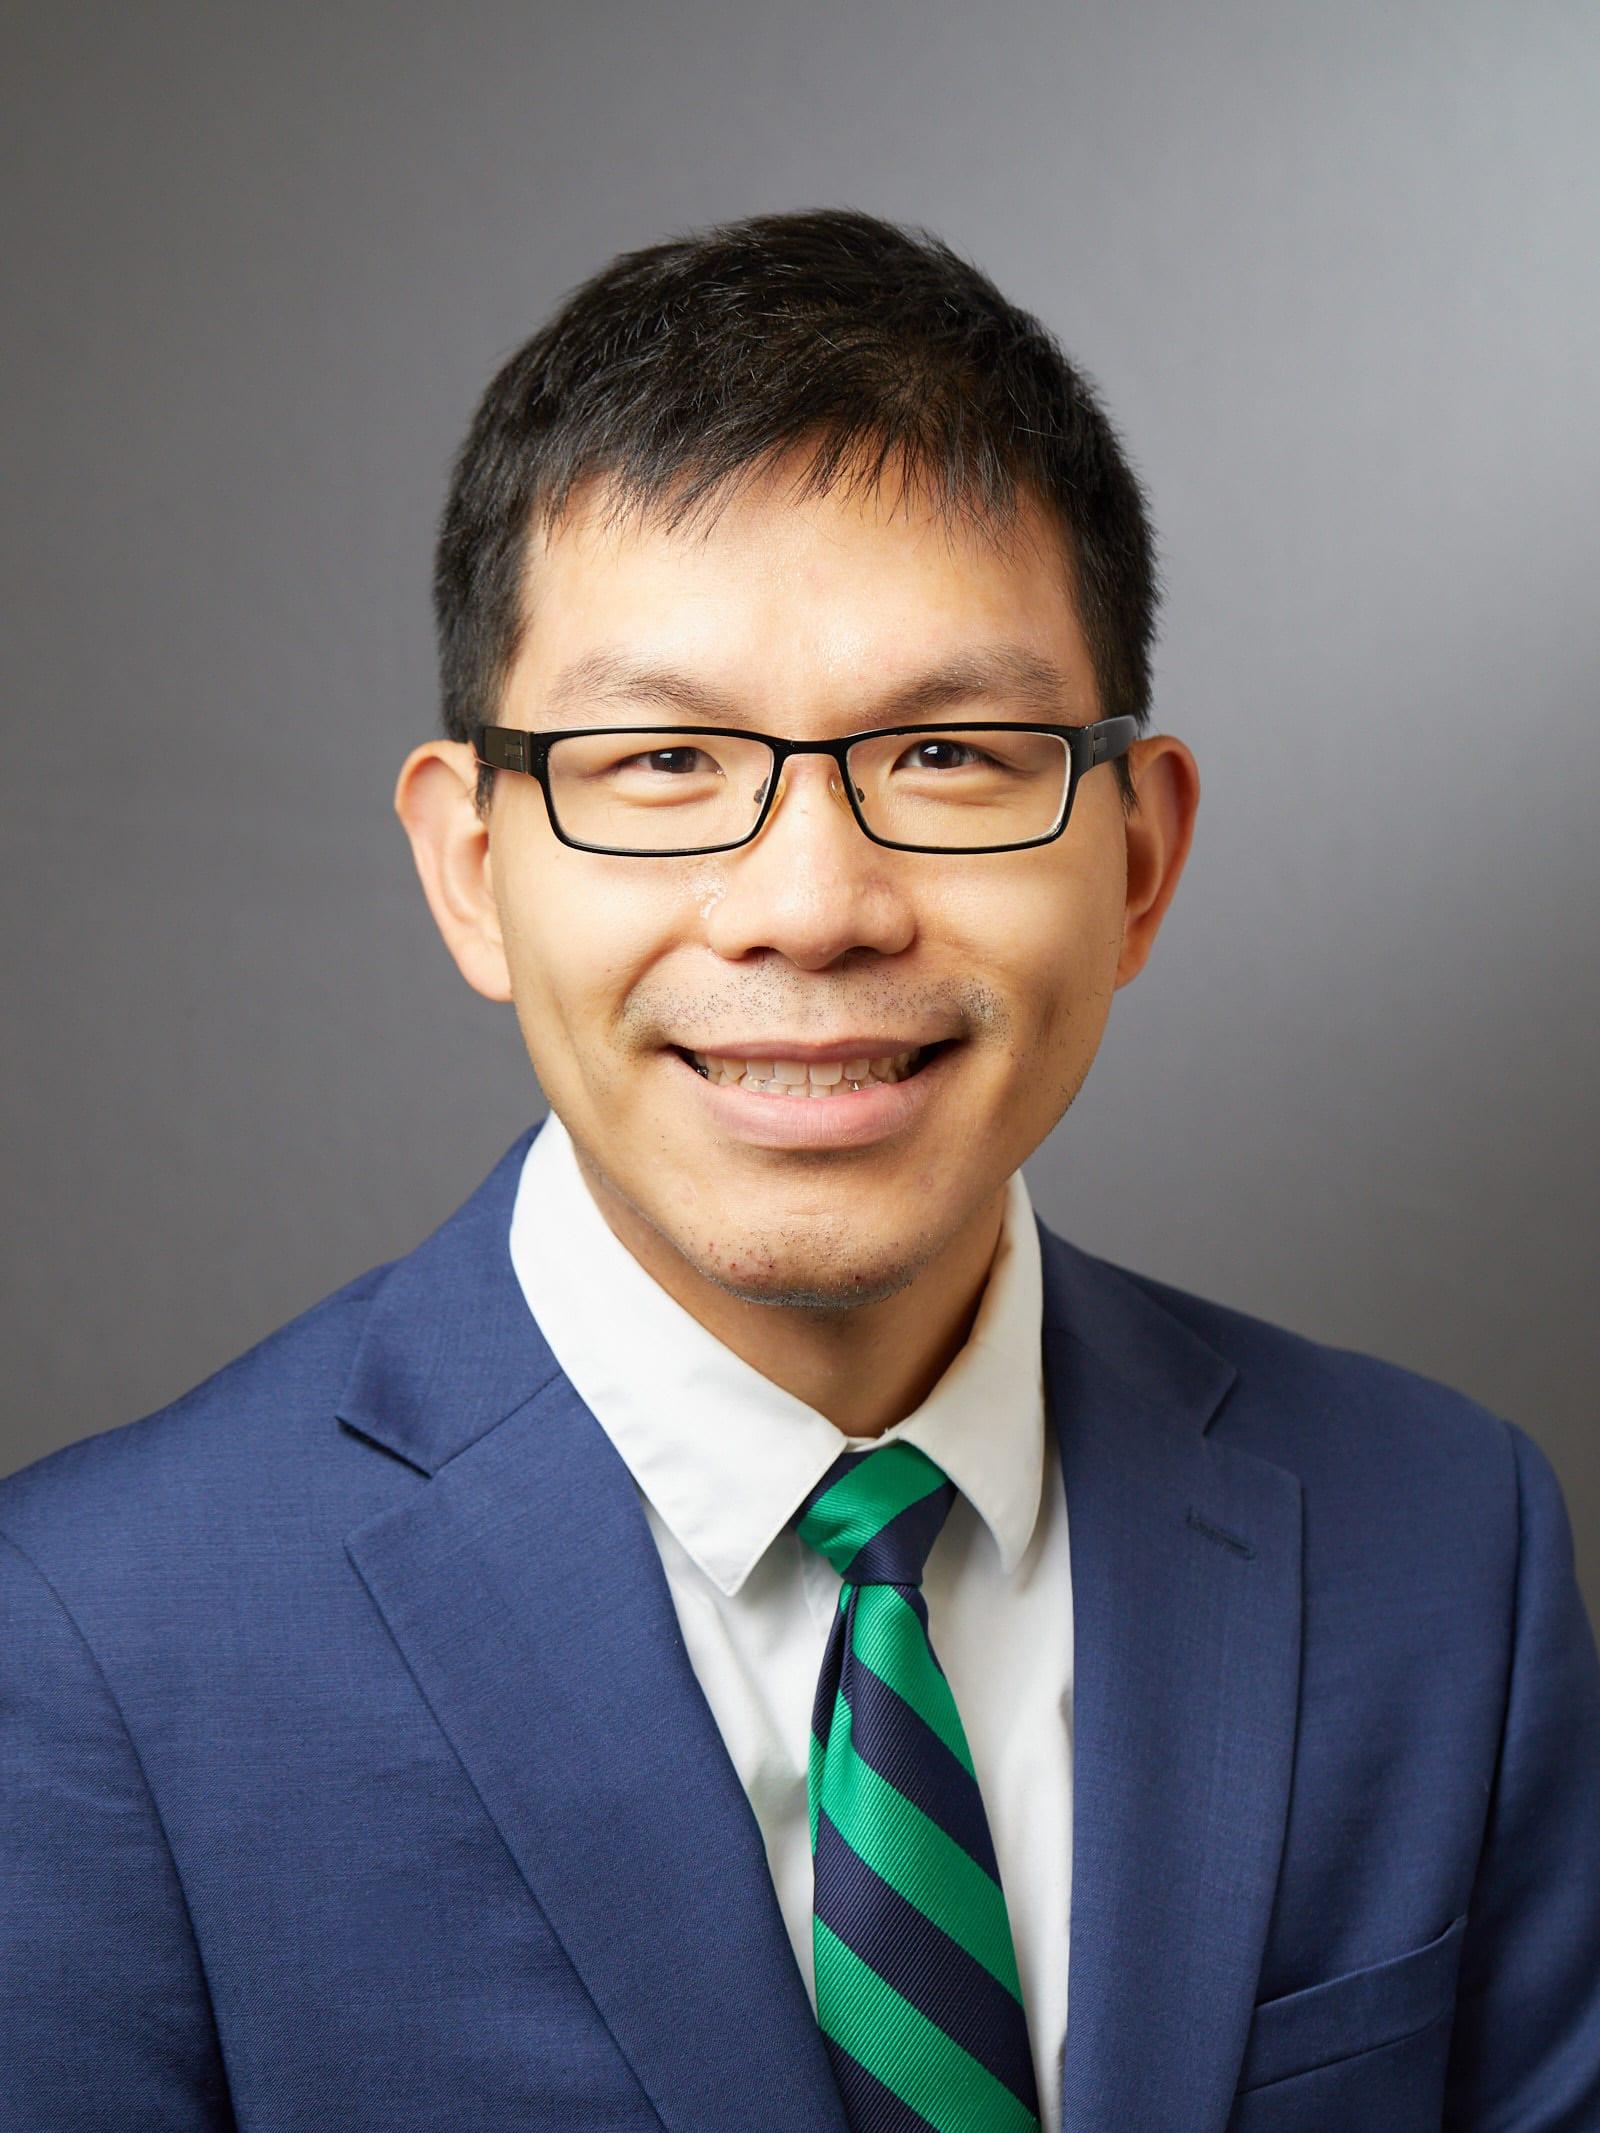 Kenneth Hung